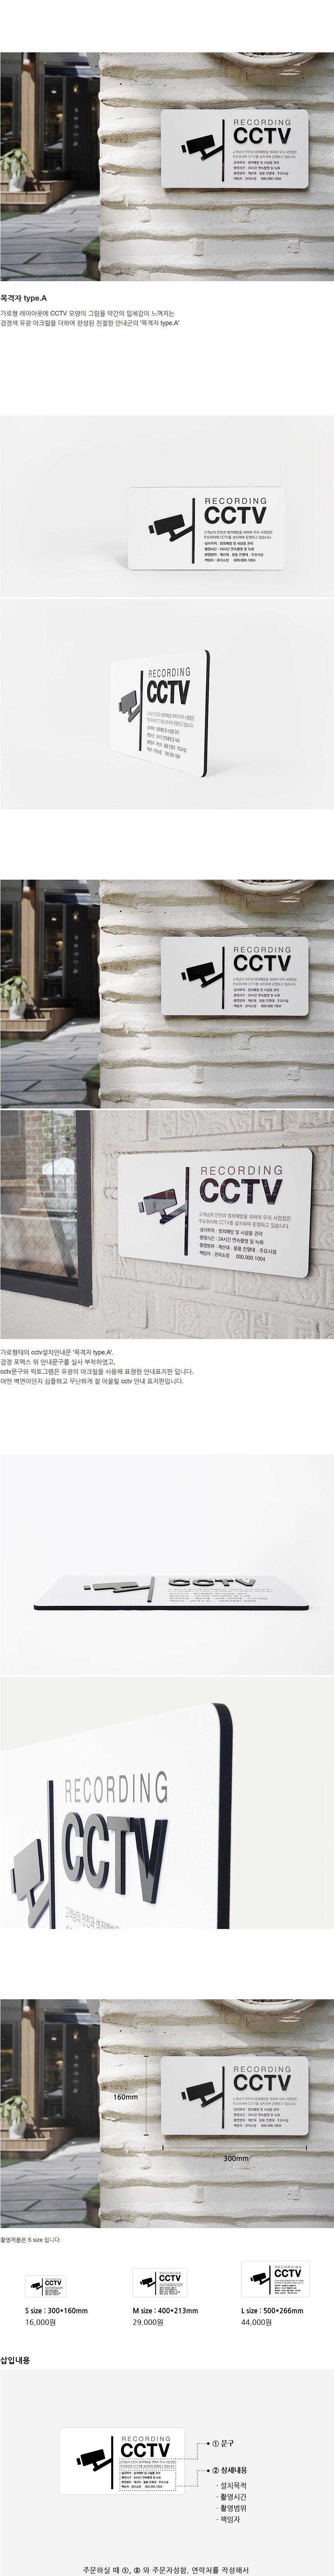 CCTV 설치 안내문 안내판 목격자 type.A - 몬스터다이버, 20,000원, 문패/보드, 아크릴문패